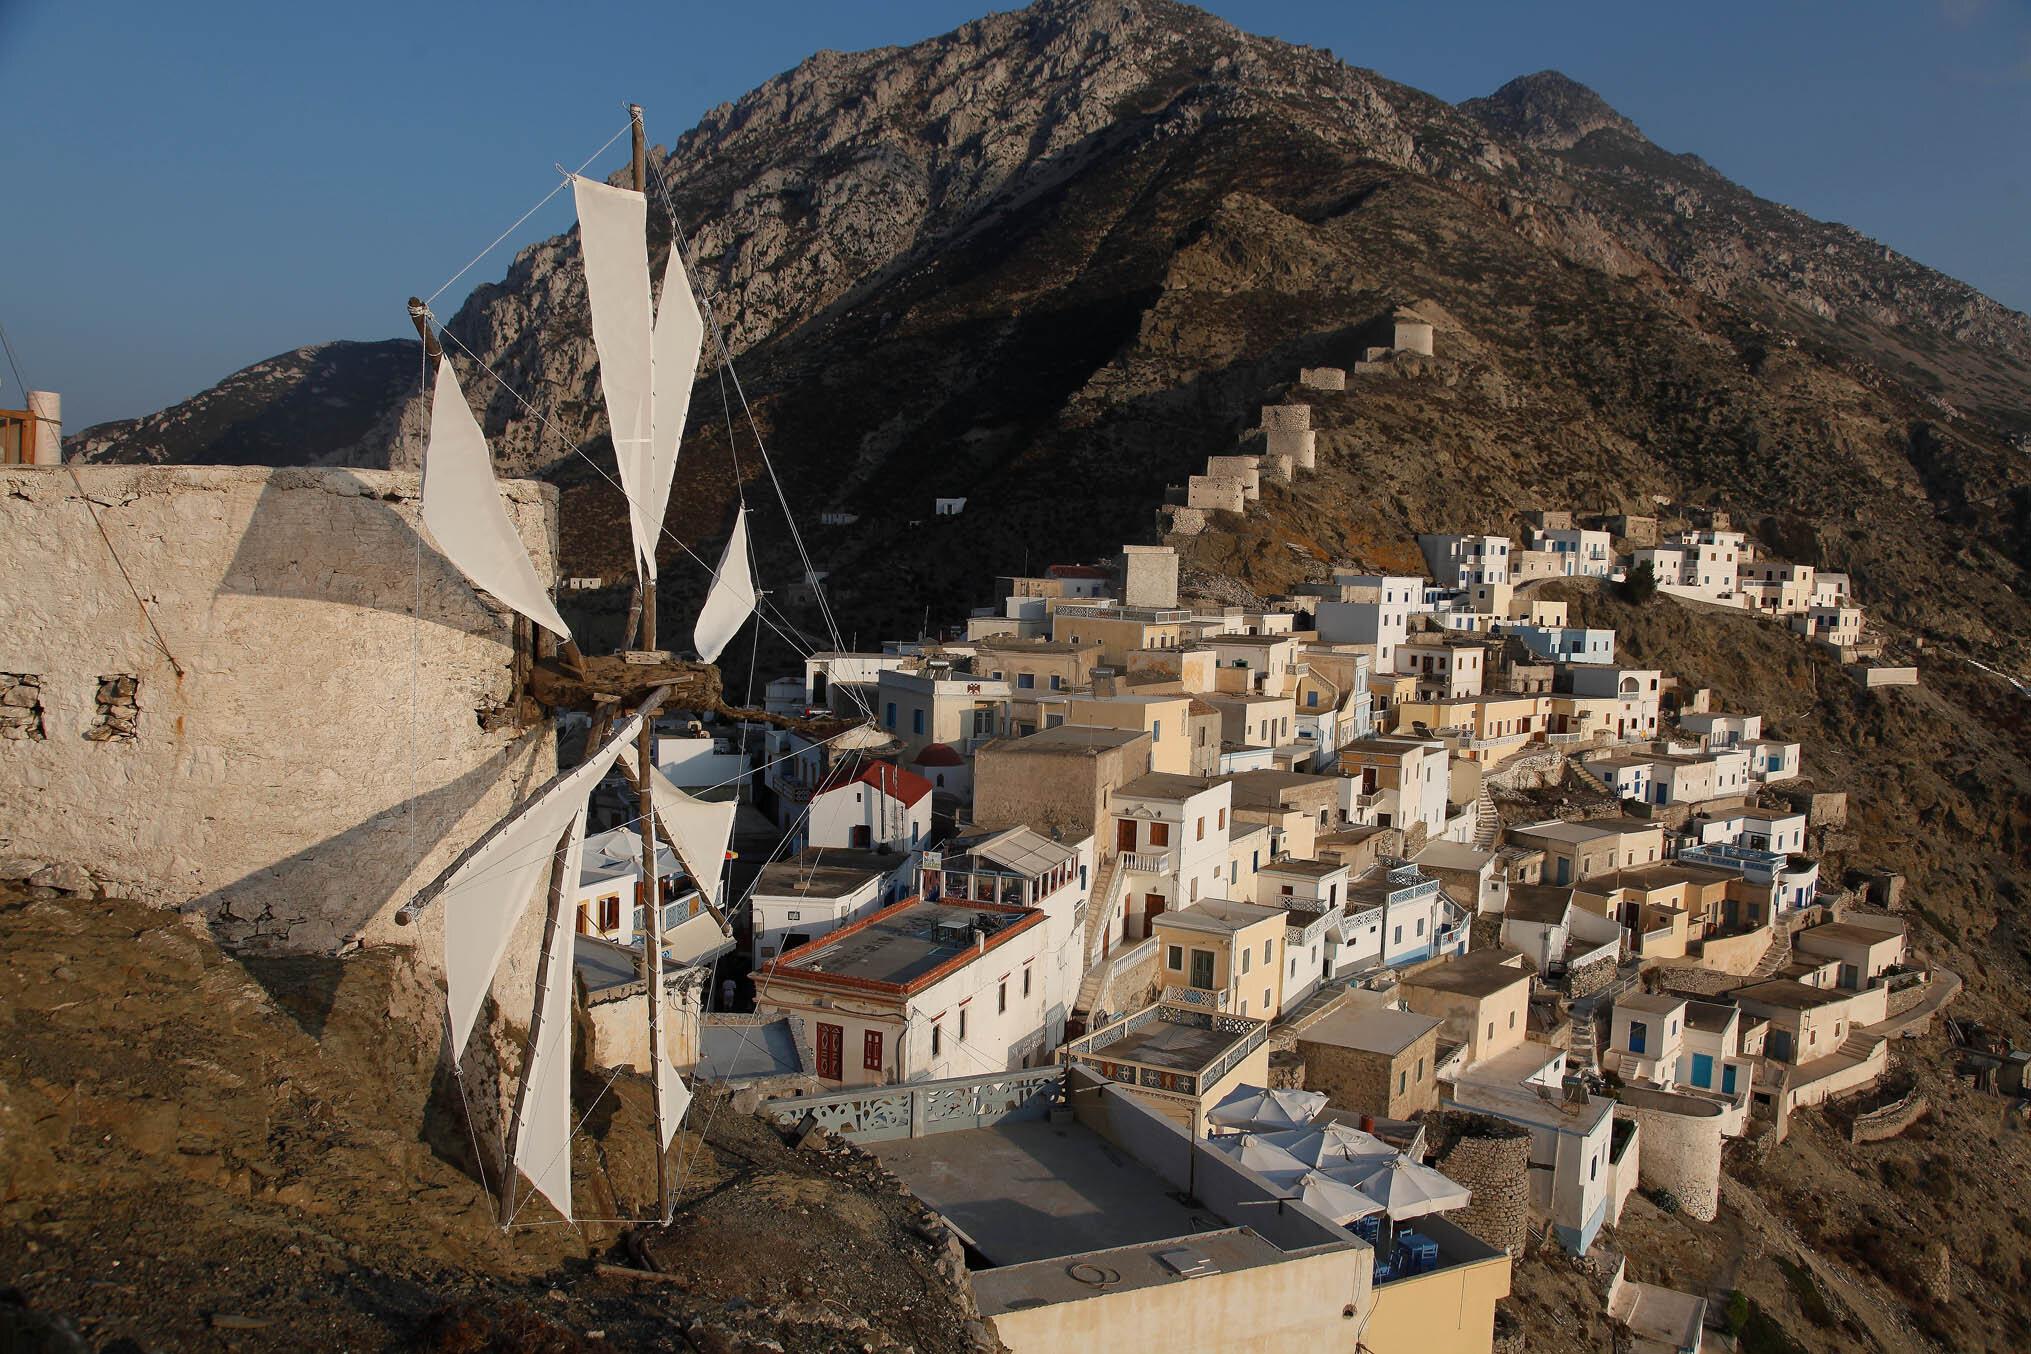 CNN: Ψάχνοντας την τελευταία μητριαρχική κοινωνία της Ευρώπης σε ένα ελληνικό